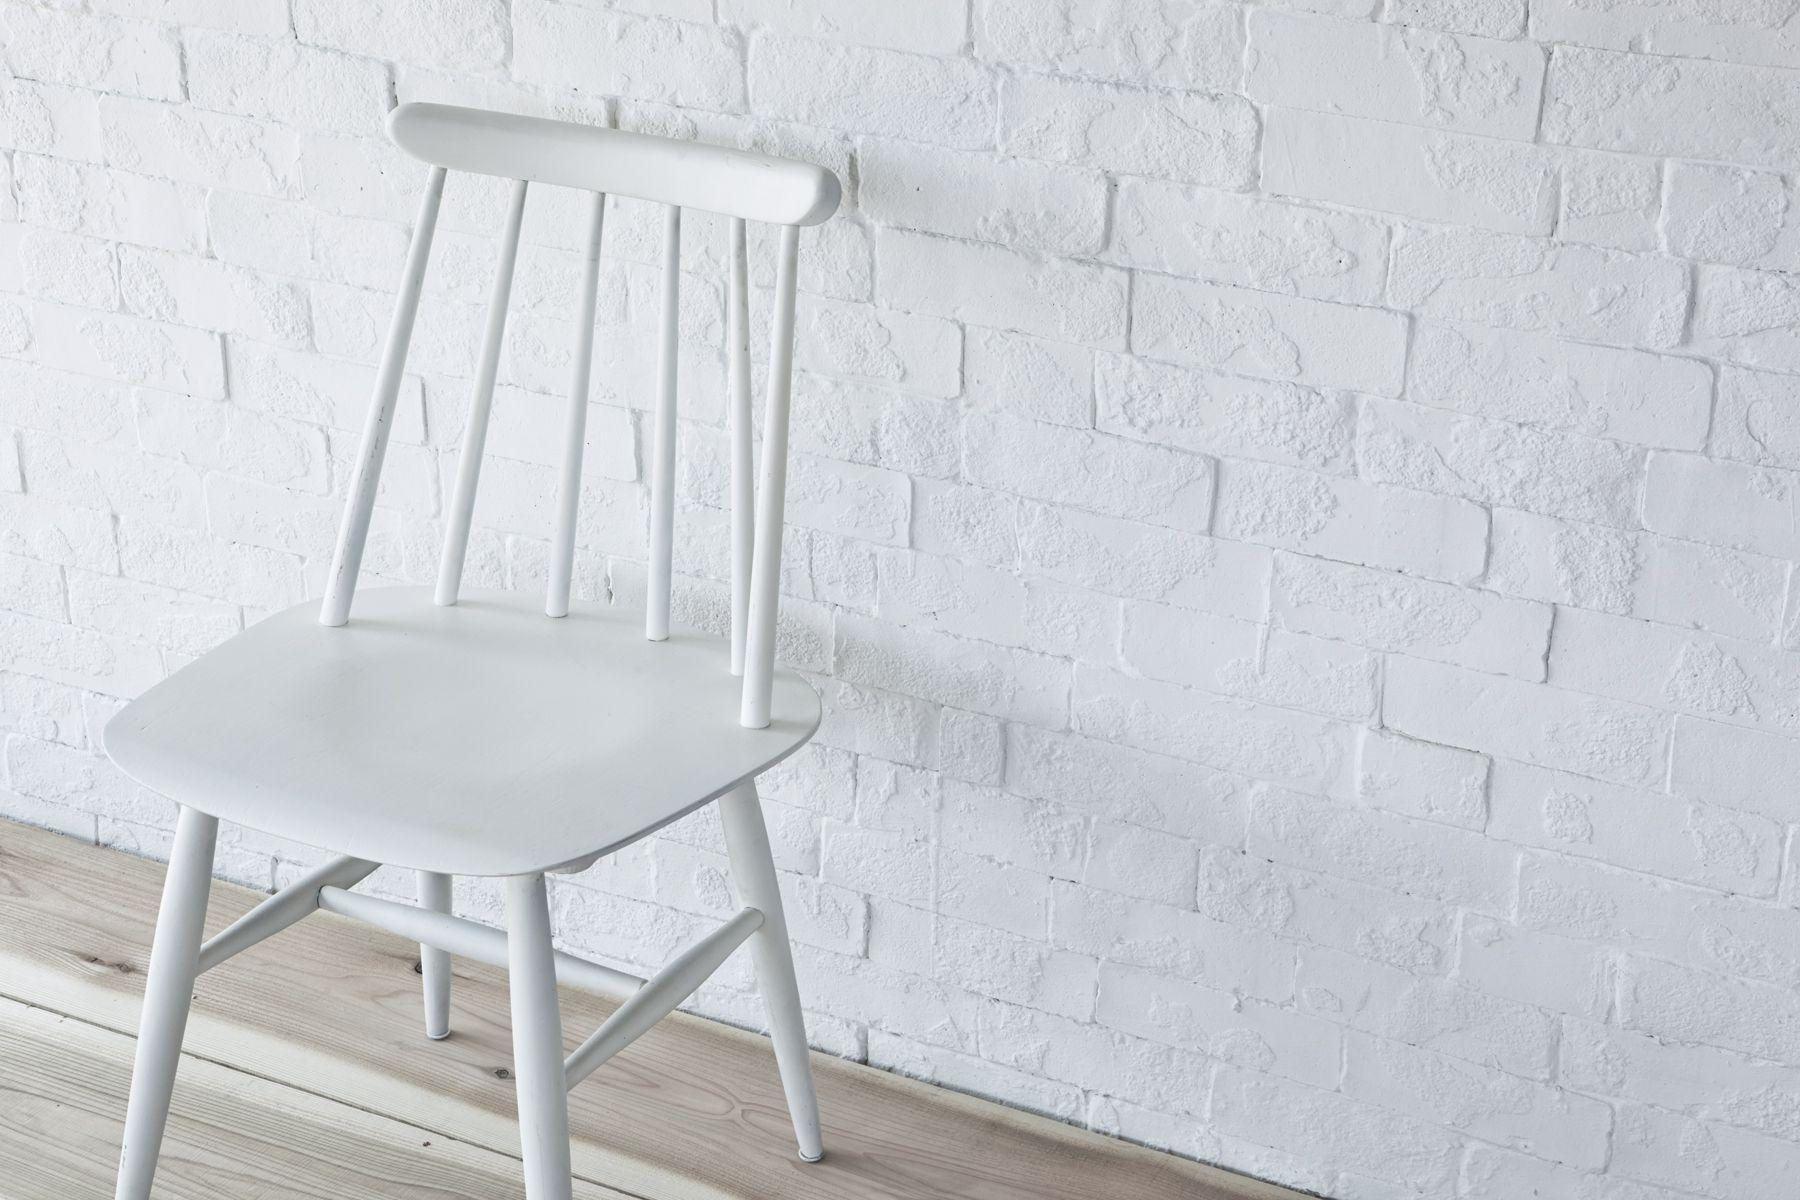 Tree&Suns Studio (ツリー&サンズ スタジオ)レンガ壁と椅子